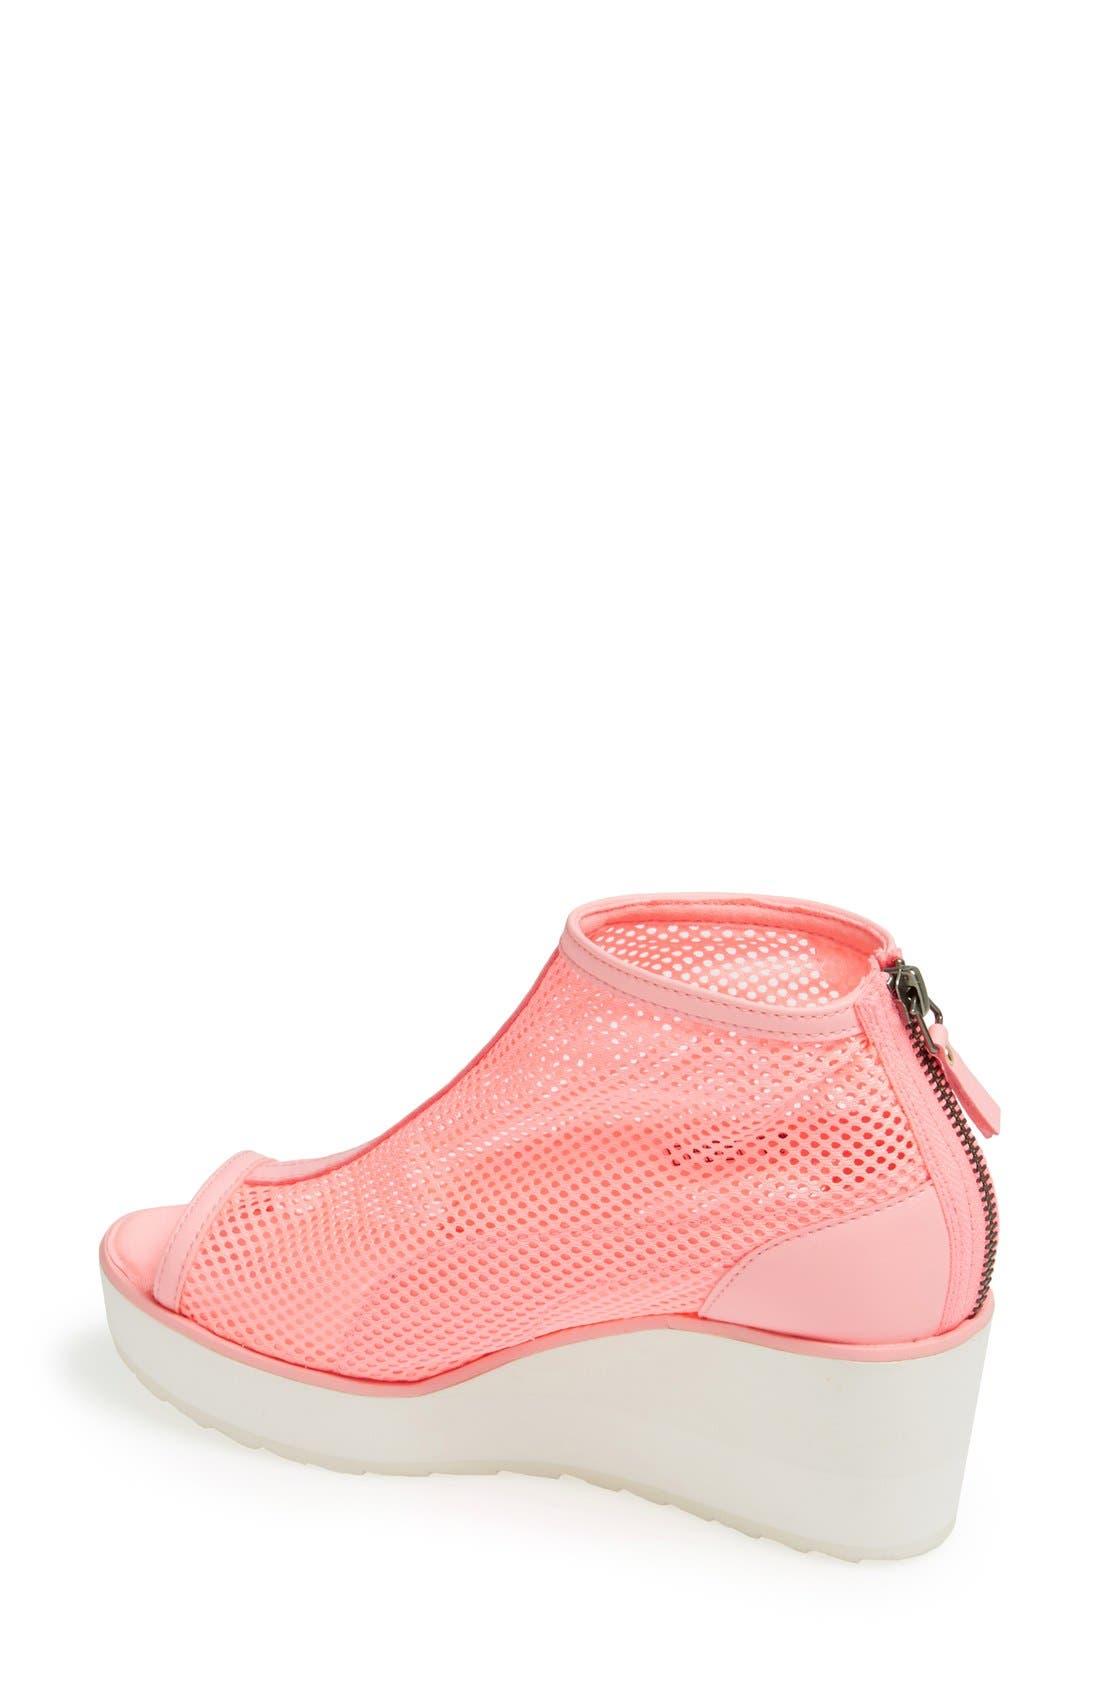 Alternate Image 2  - PUMA by Hussein Chalayan 'Hakkoda' Open Toe Wedge Sneaker